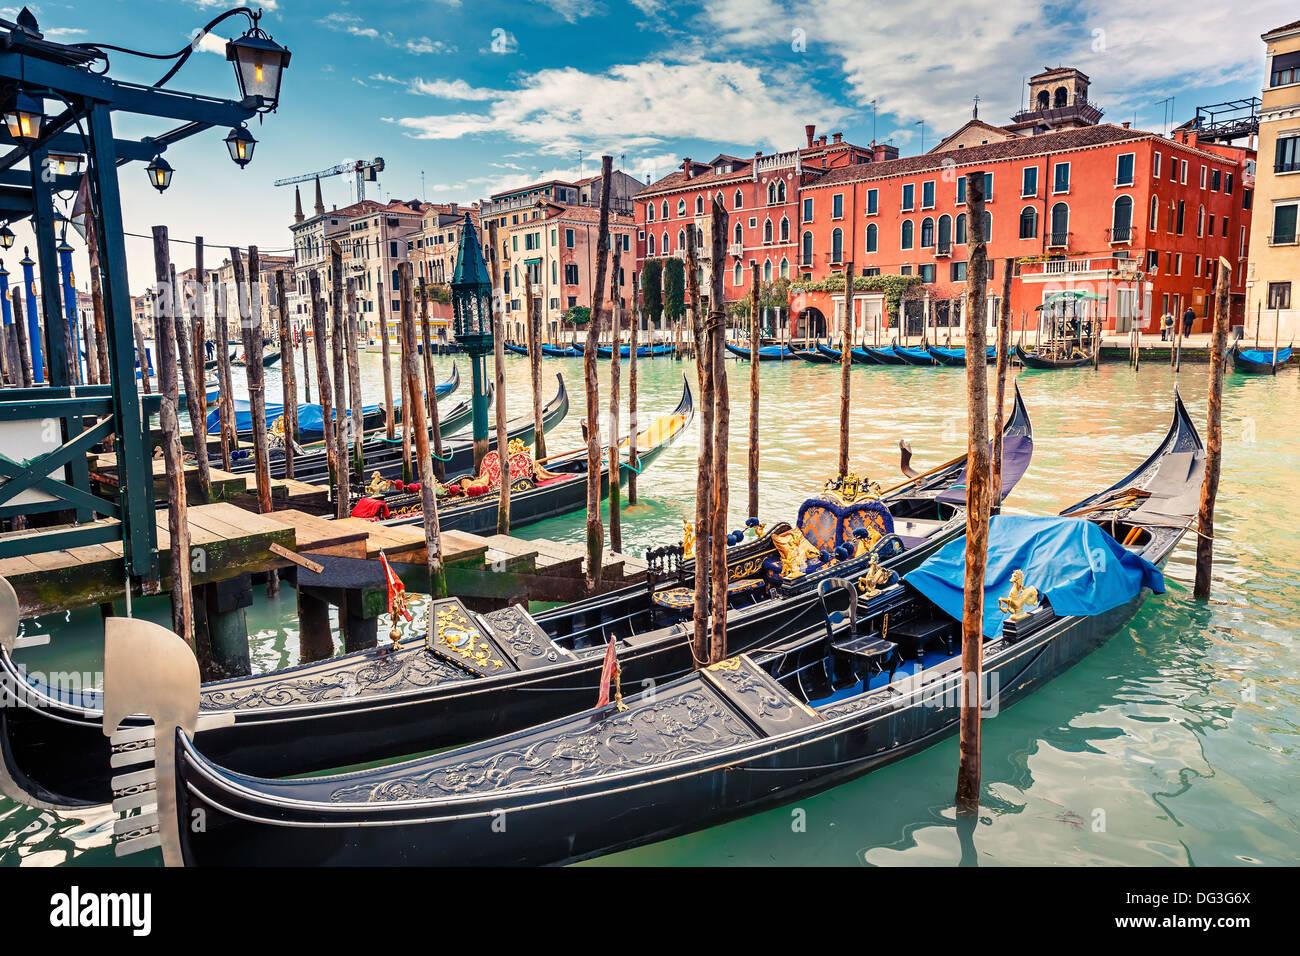 Gondolas on Grand canal in Venice - Stock Image